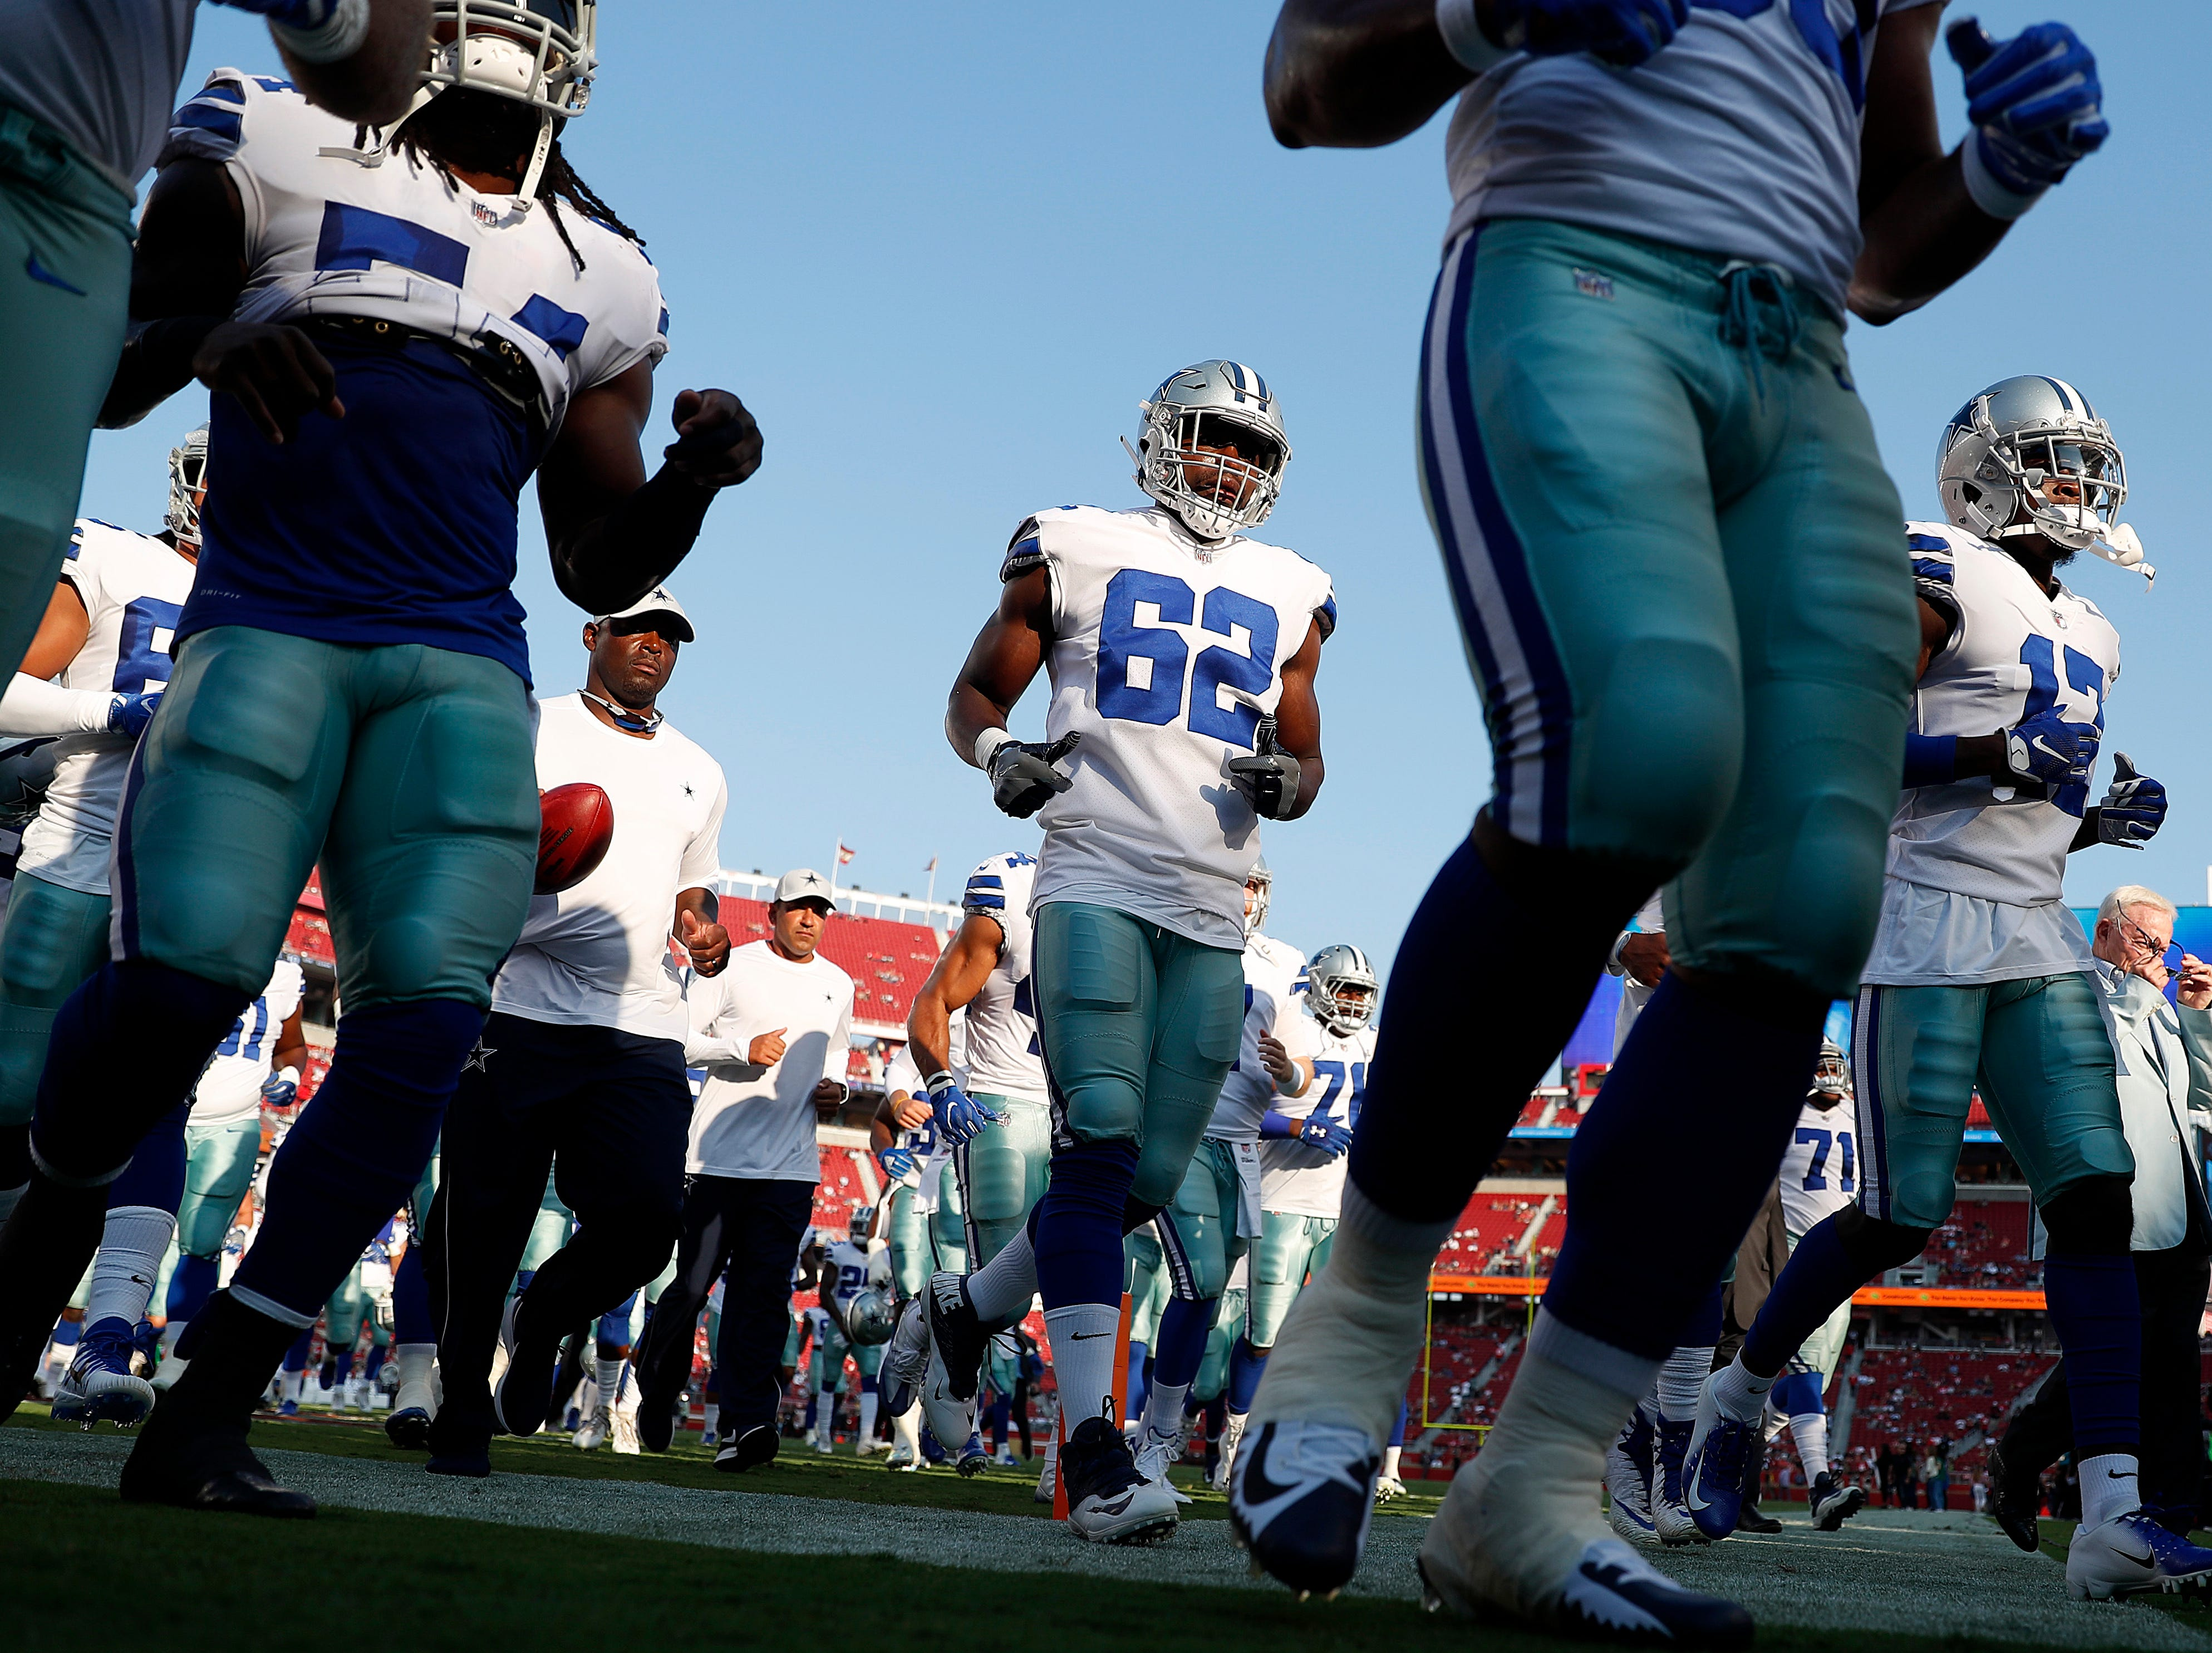 Dallas Cowboys players run off the field before an NFL preseason football game between the San Francisco 49ers and the Cowboys in Santa Clara, Calif., Thursday, Aug. 9, 2018. (AP Photo/Tony Avelar)